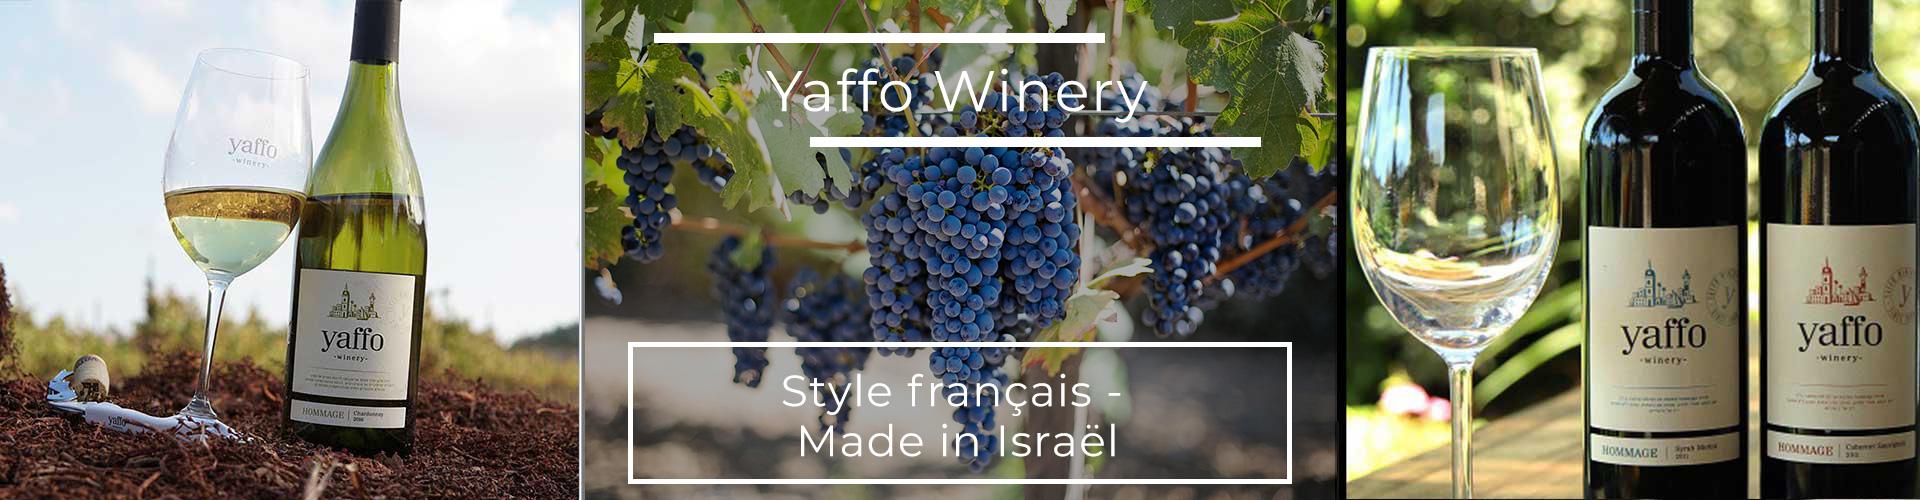 Negev Desert YAFFO WINERY - Vins & Epicerie Fine casher/cacher d'Israël à Genève en Suisse - Negev Desert